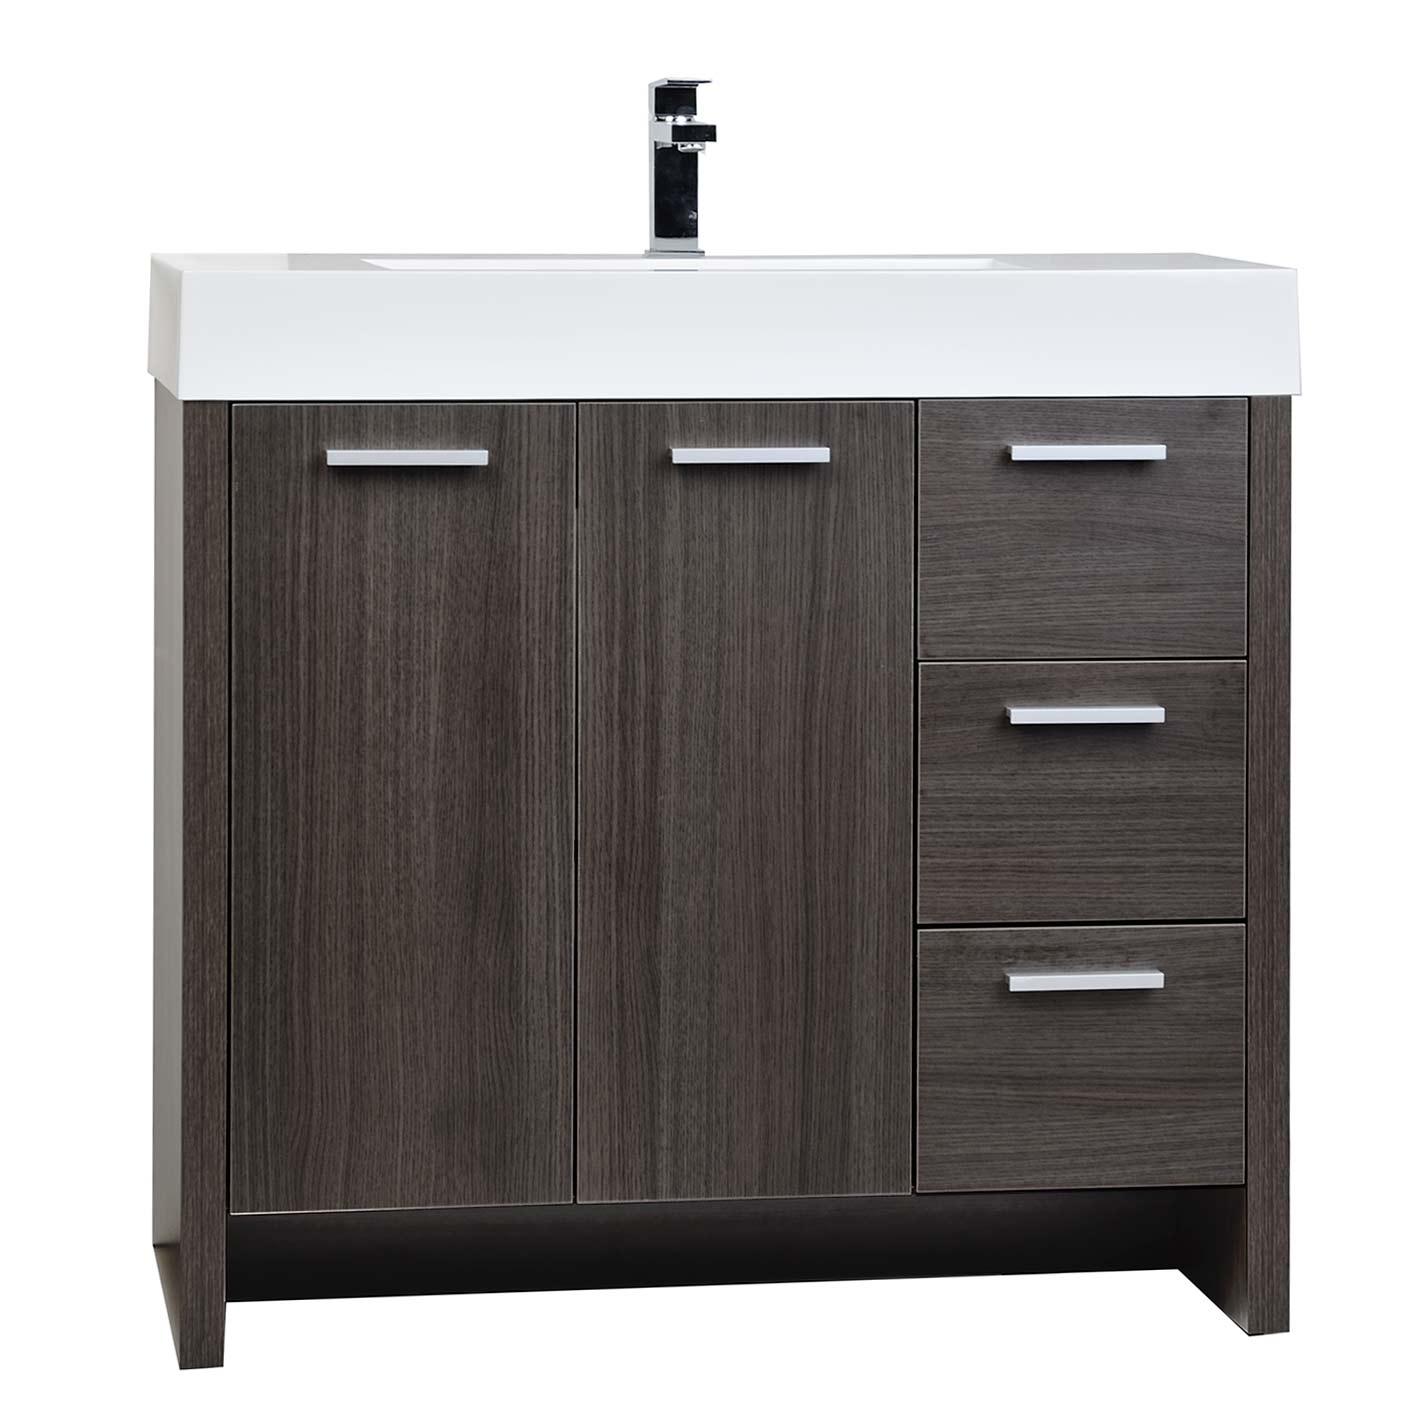 Buy 355 Modern Bathroom Vanity Grey Oak Finish TNLY900